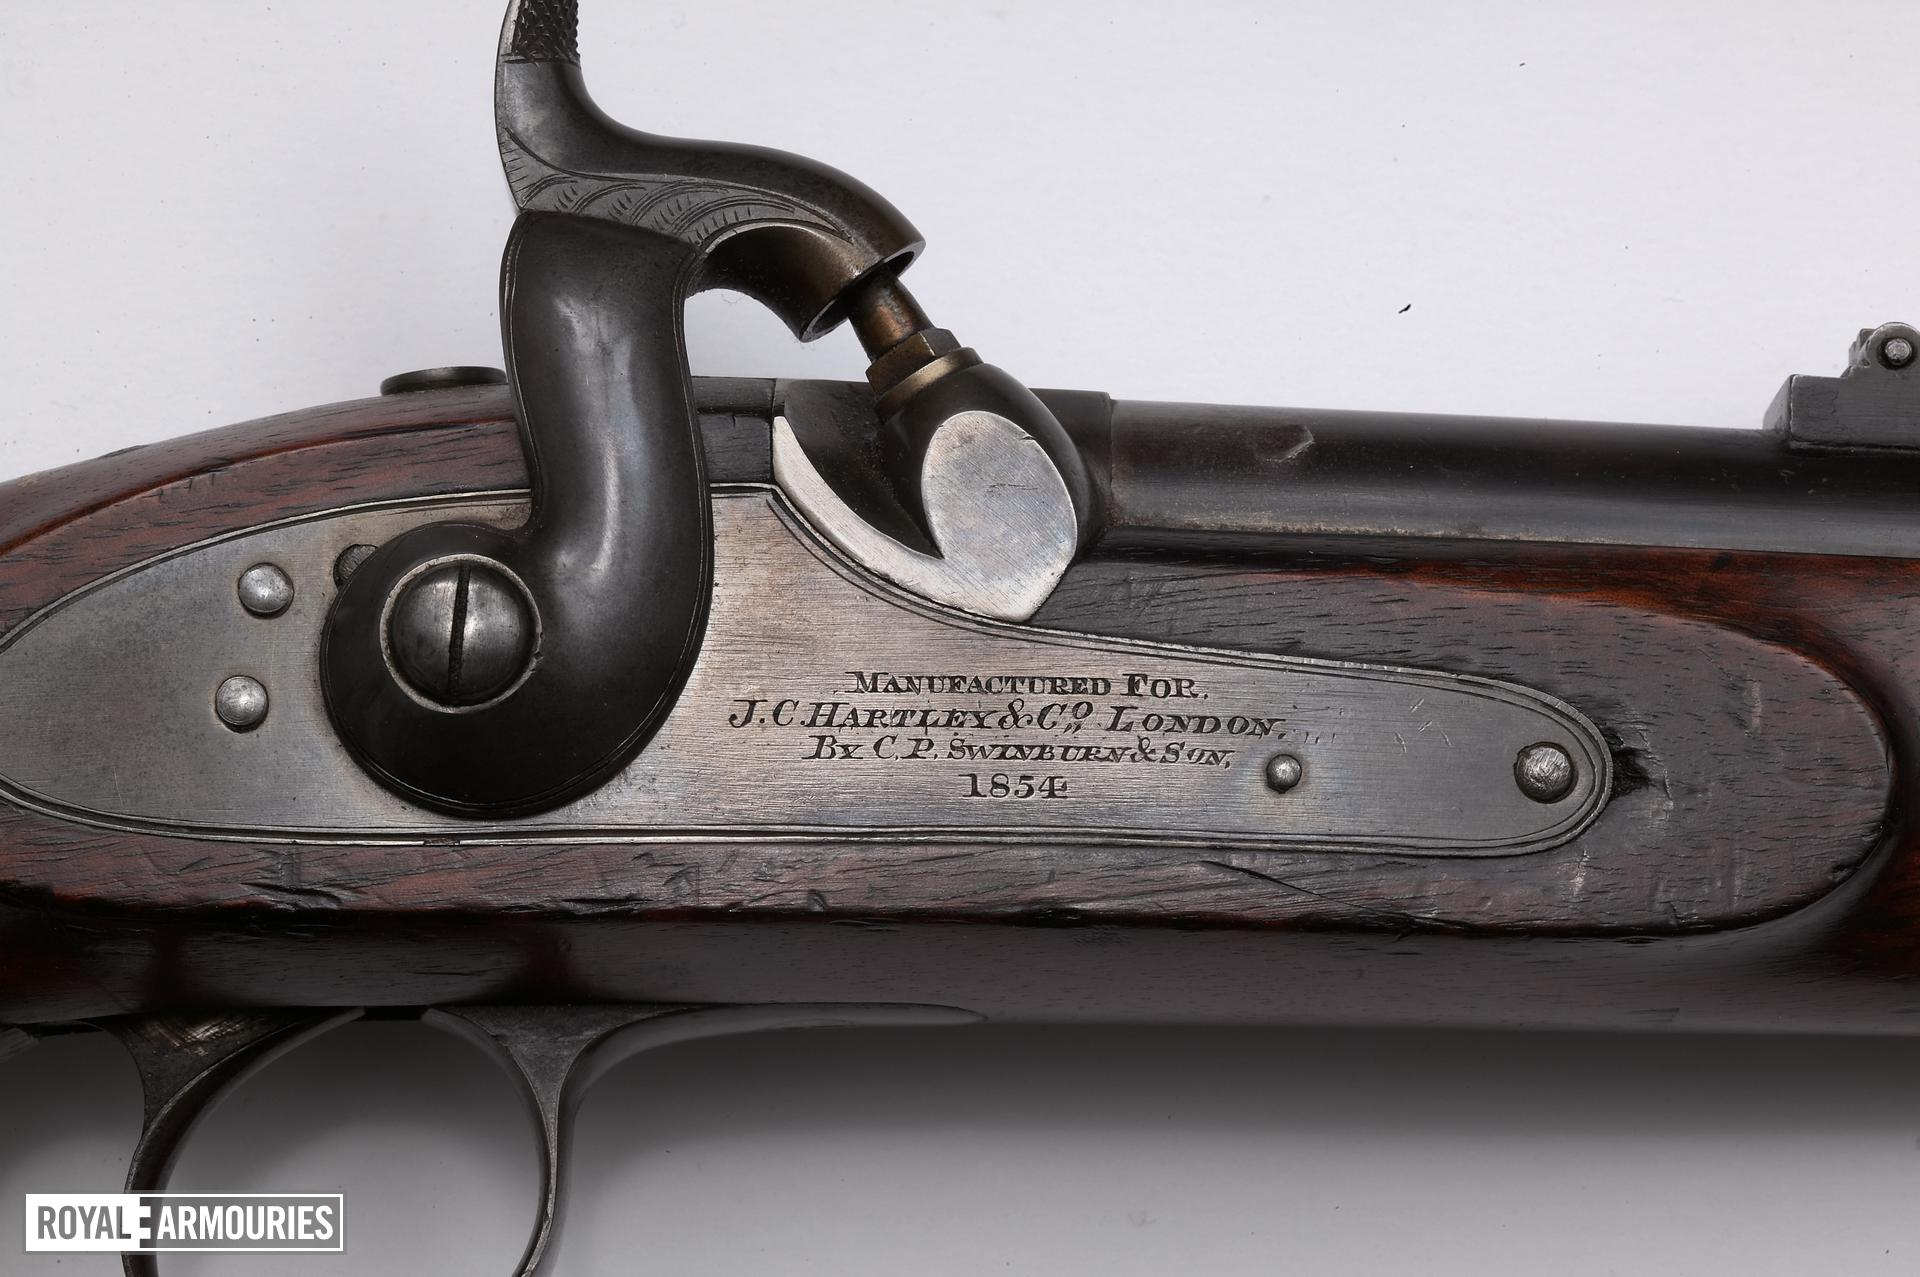 Percussion muzzle-loading military rifle - Jacob Pattern 1853 Of Enfield pattern by C.P. Swinburn, Major John Jacobs pattern